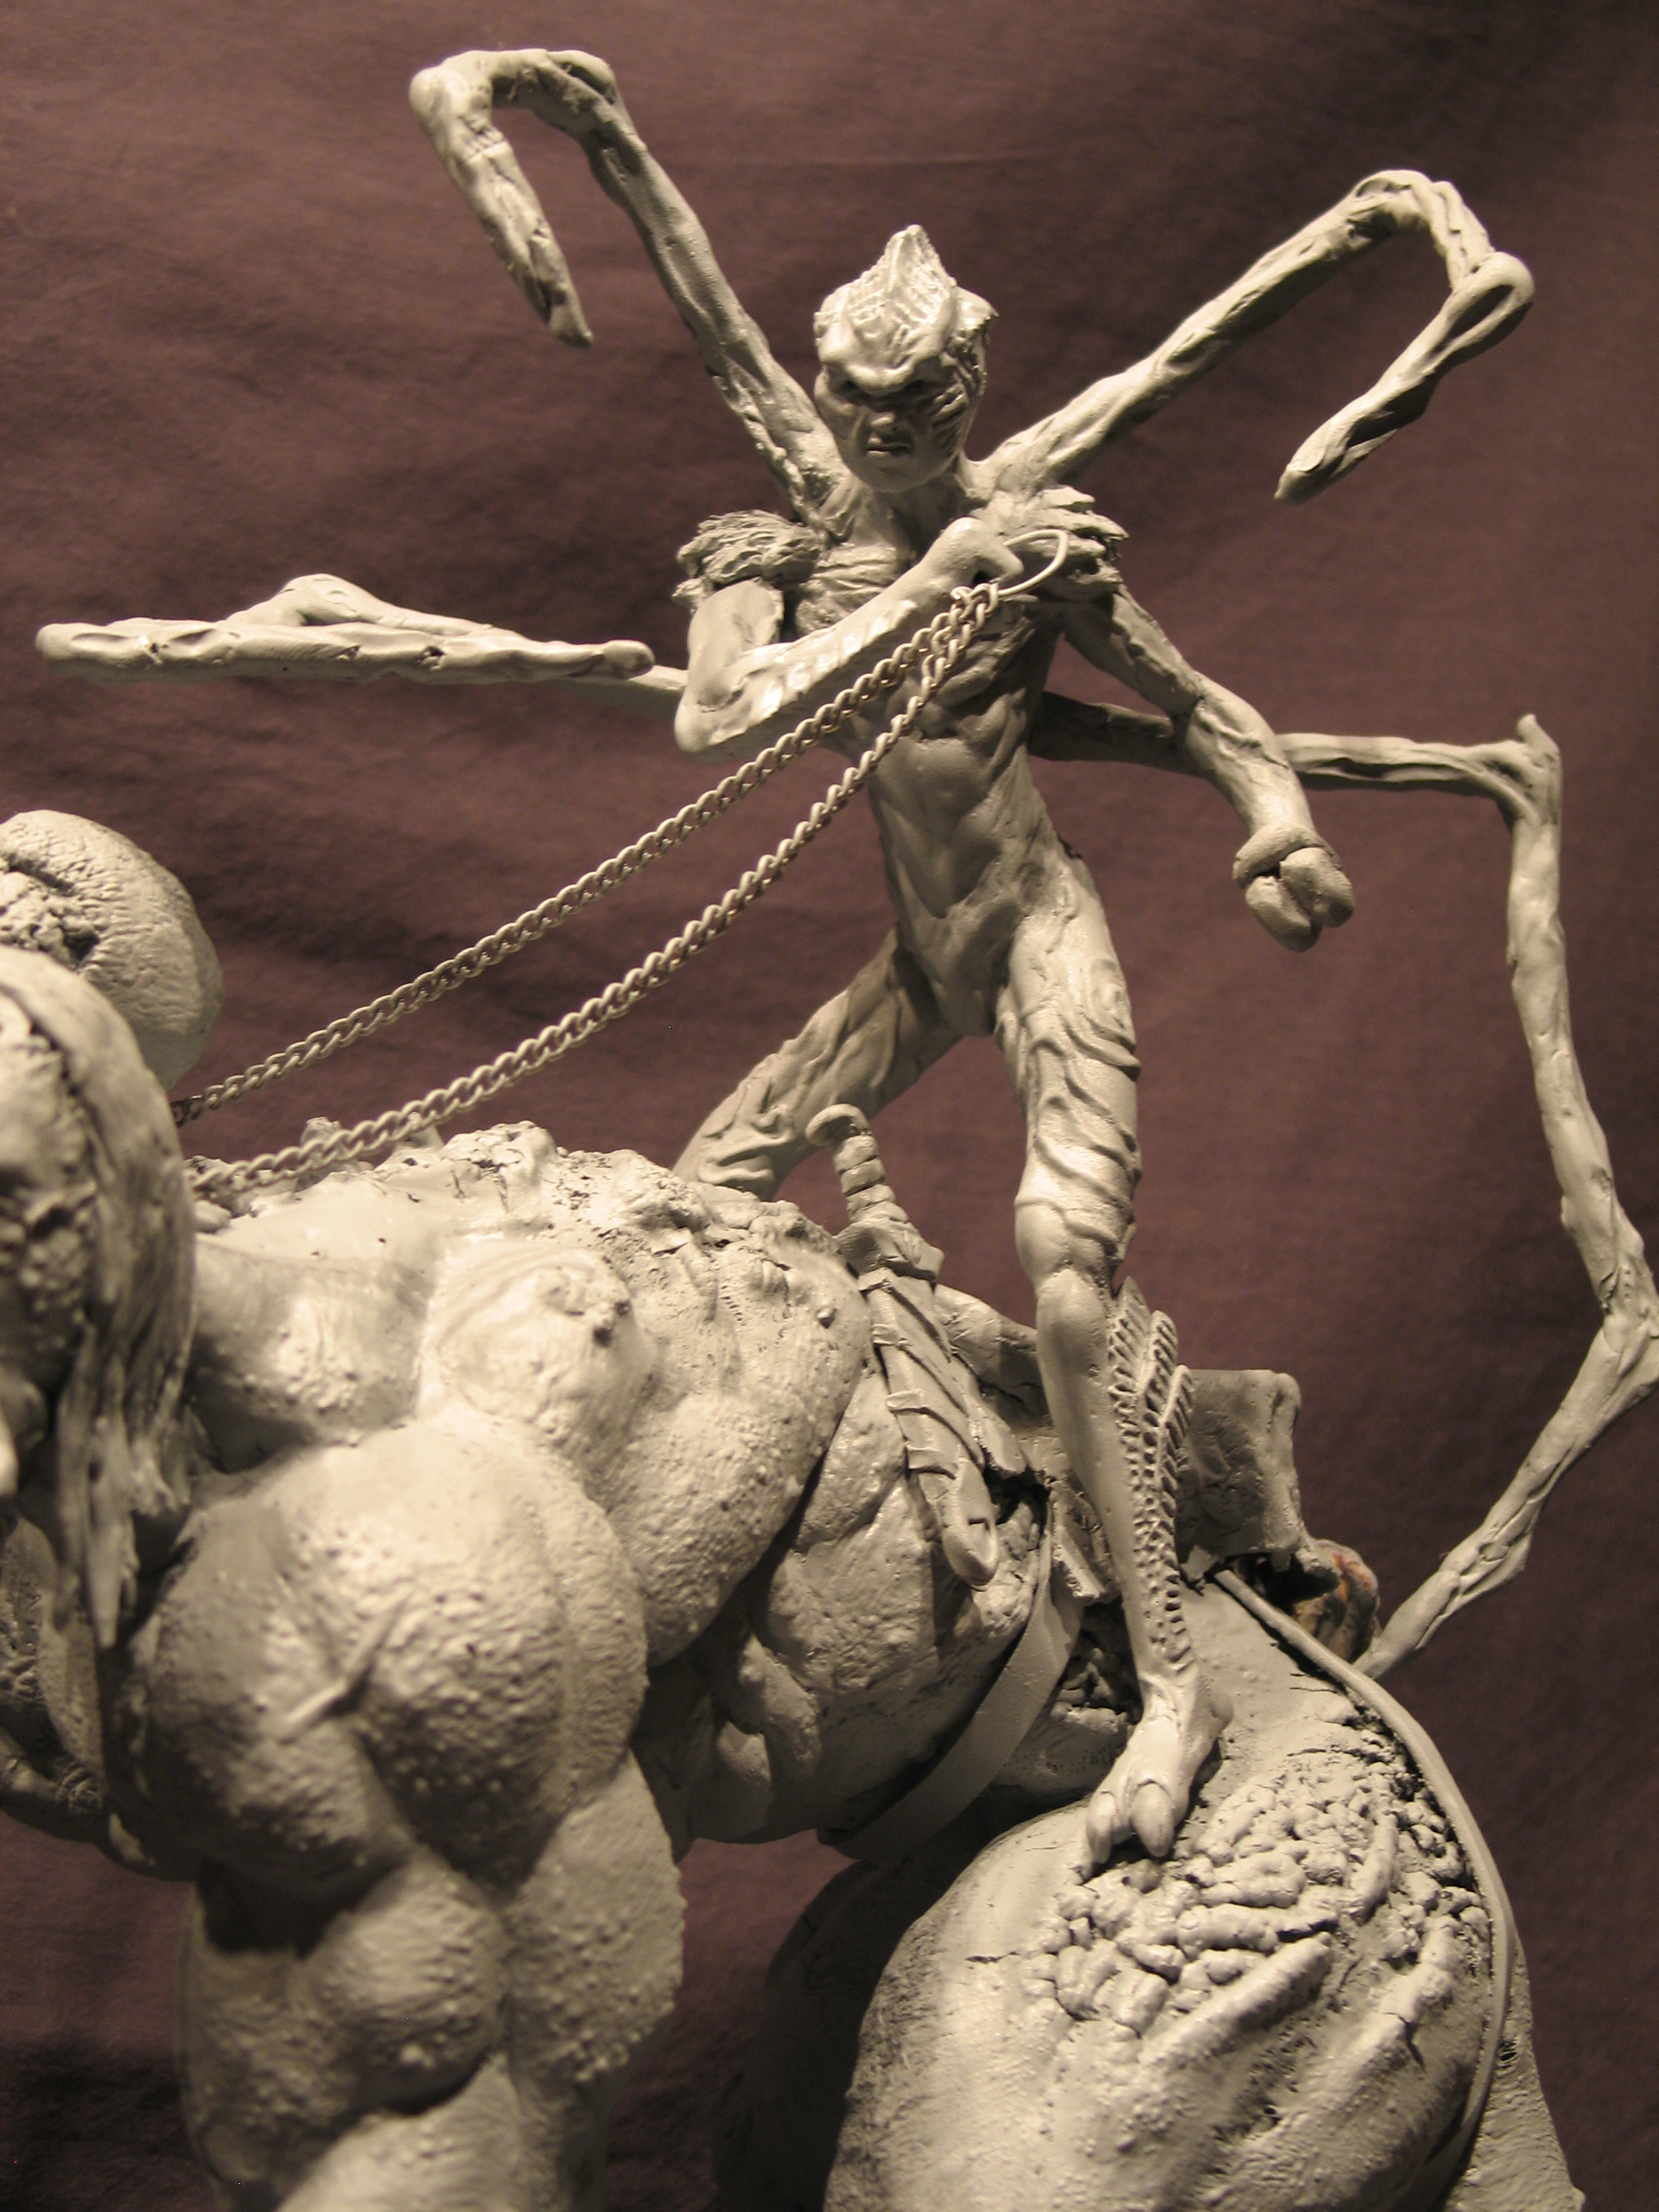 Spiderzero Riding the Shiflett Monster (Concours Shiflett 2) S178